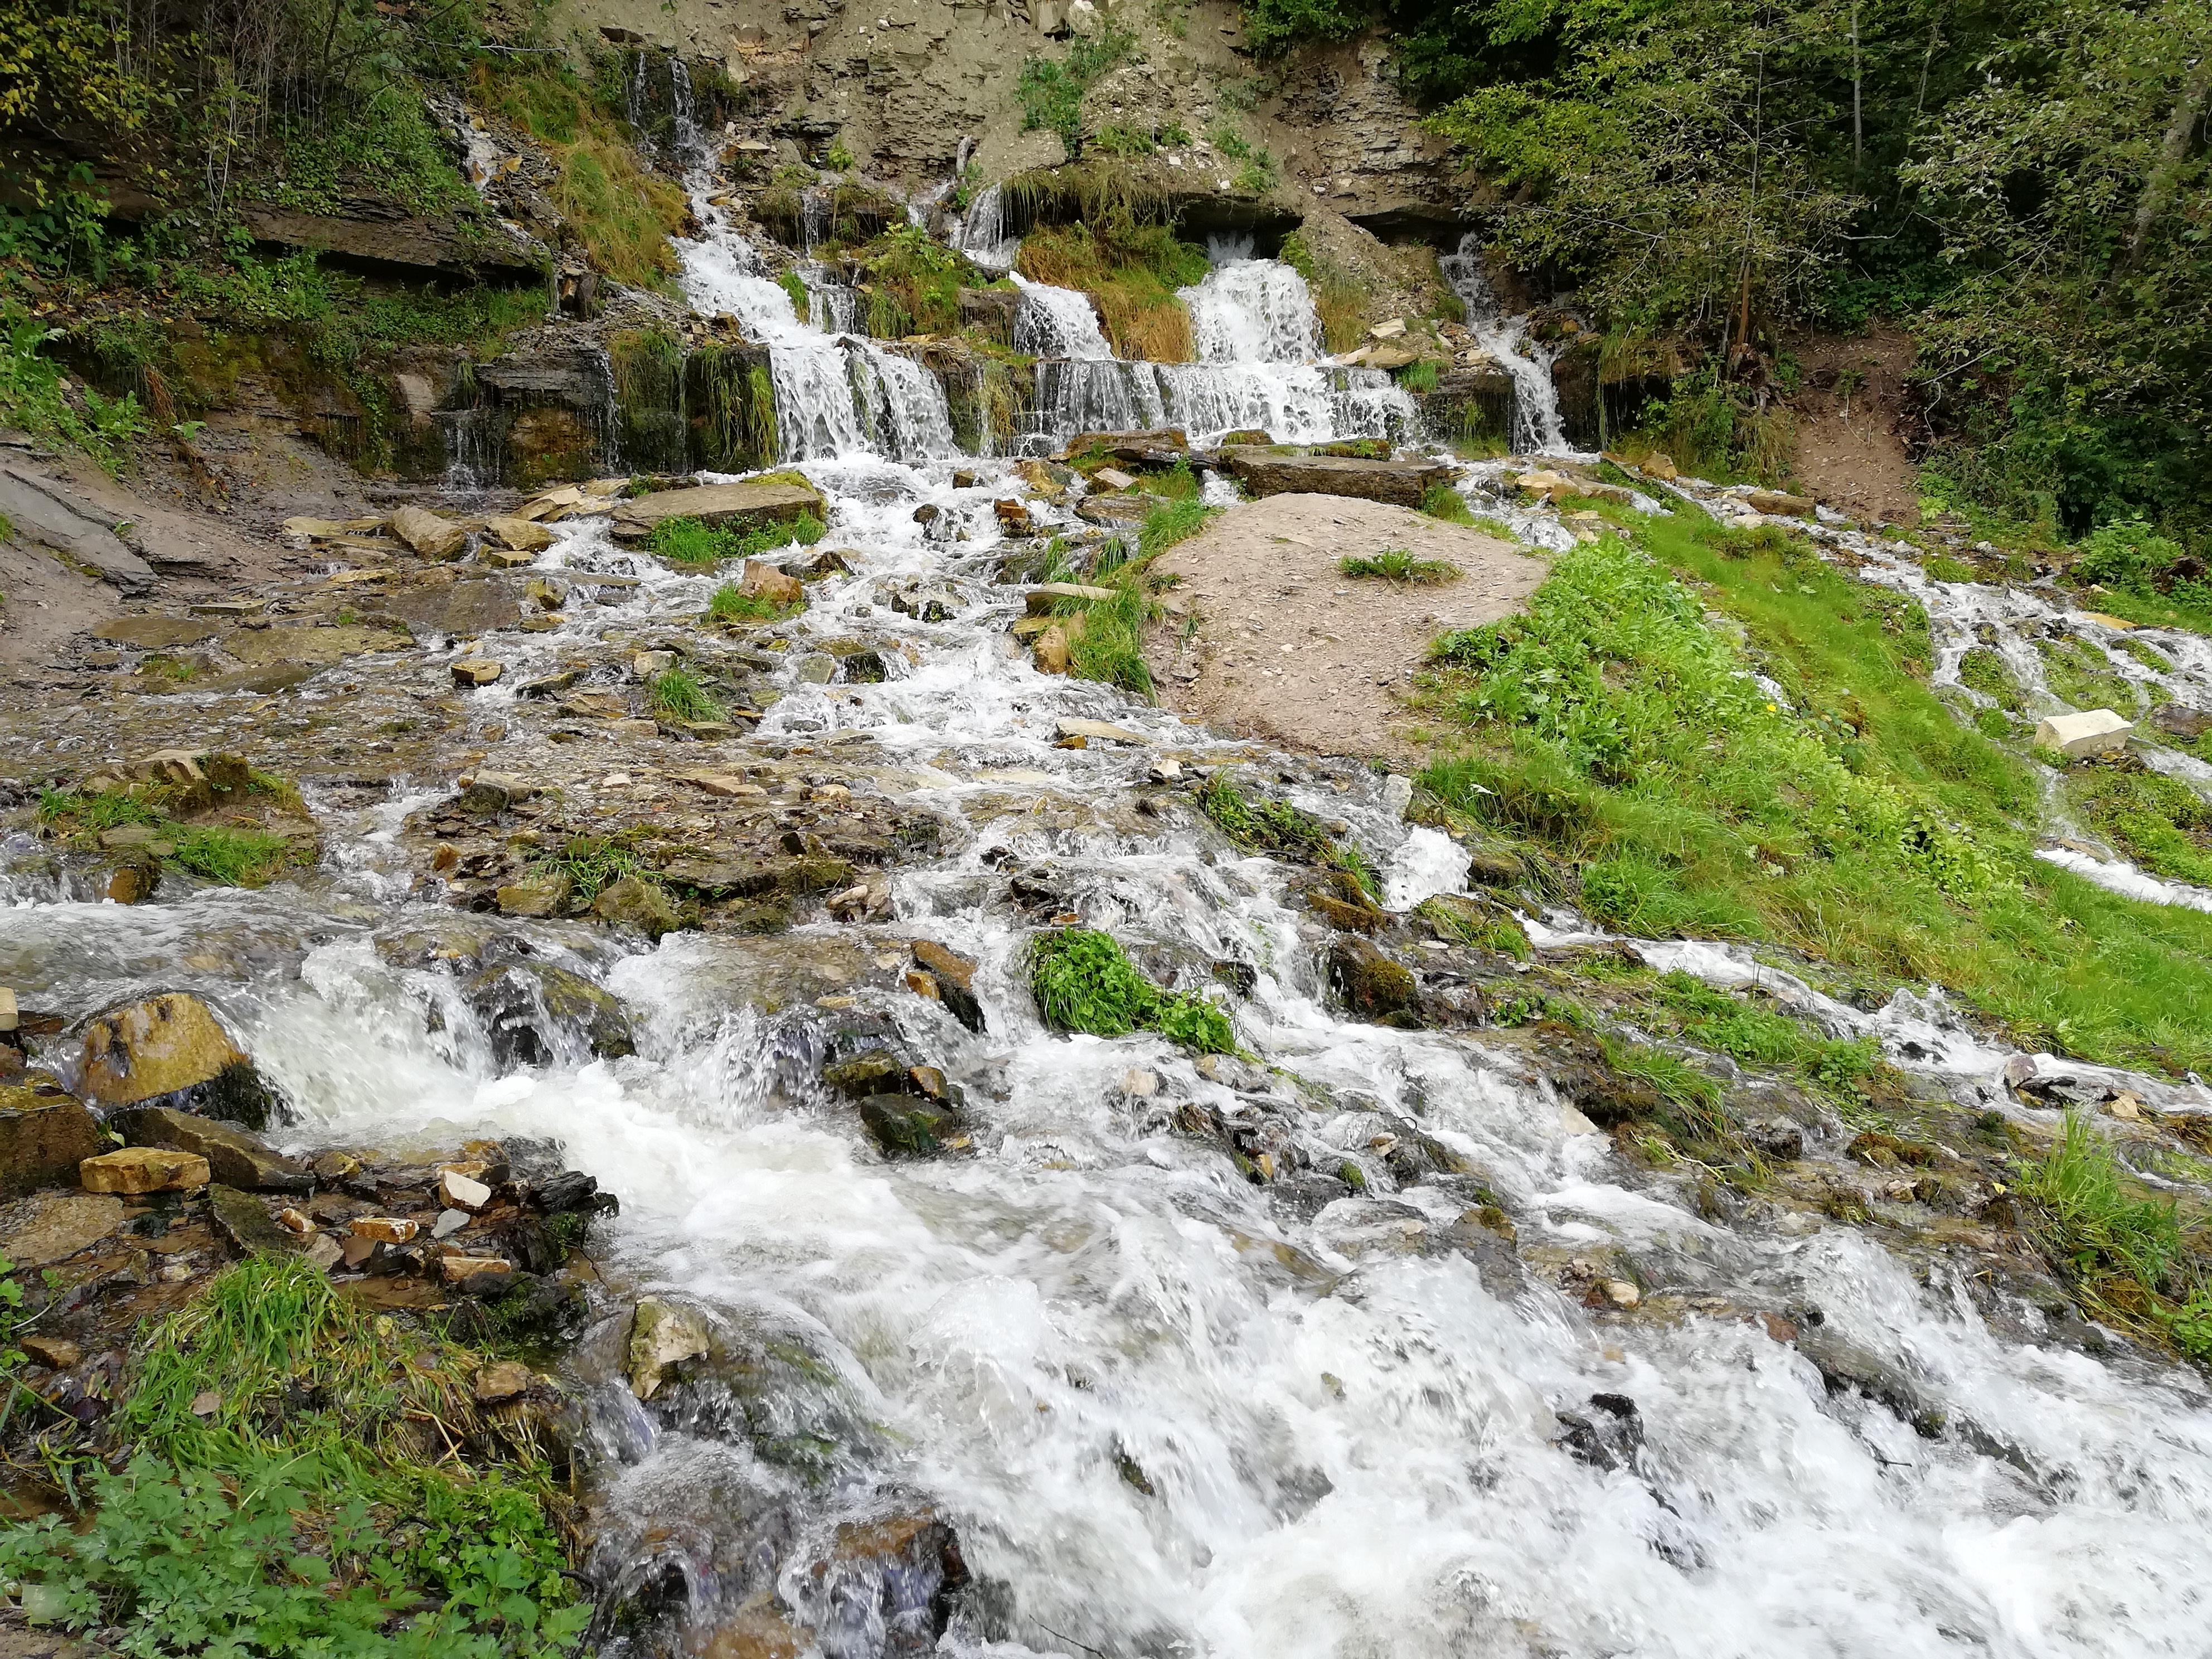 Slavonic Springs